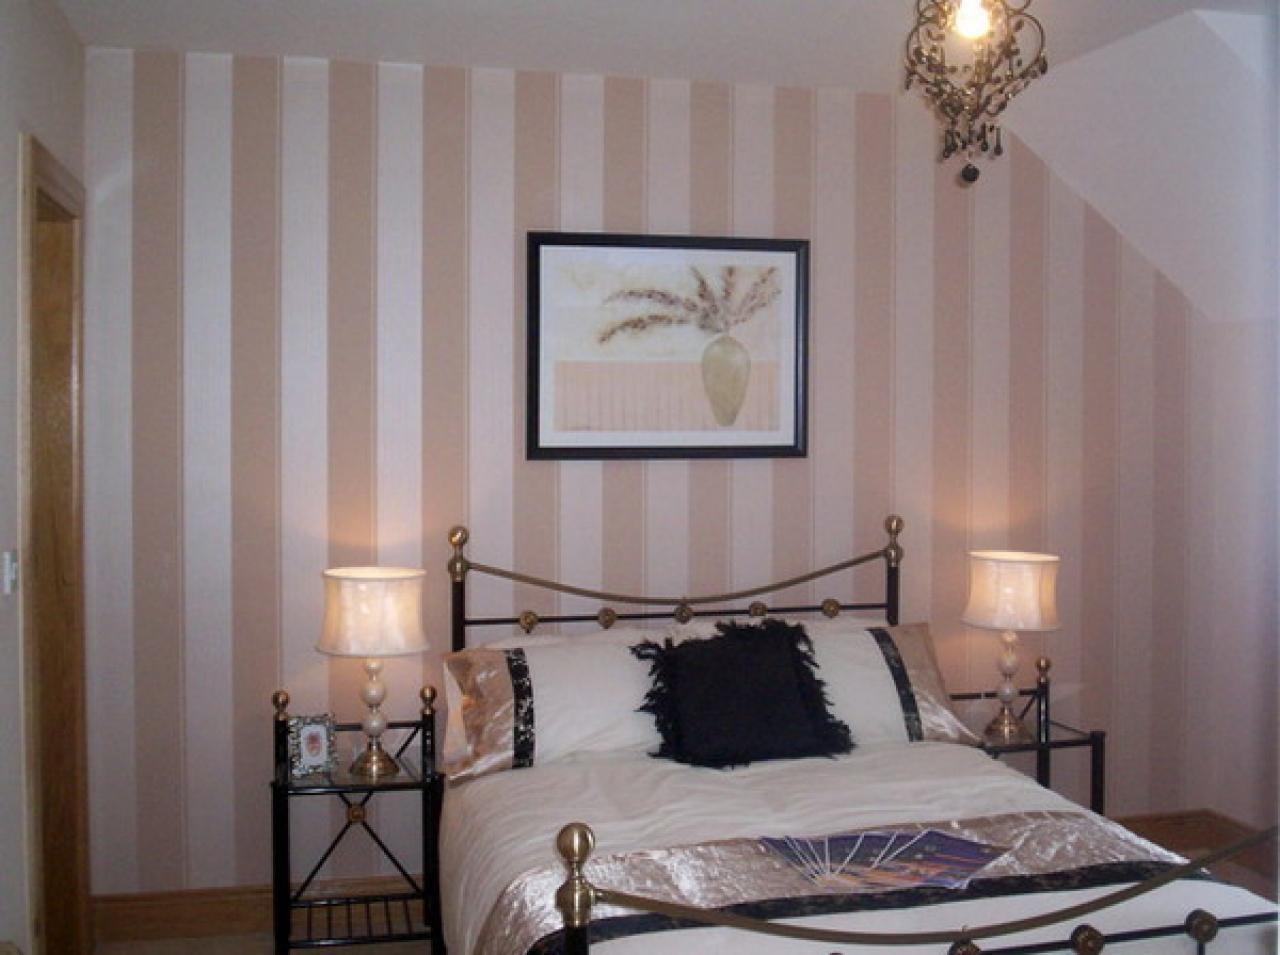 Small bedroom wallpaper borders ideas small master bedroom 1280x955